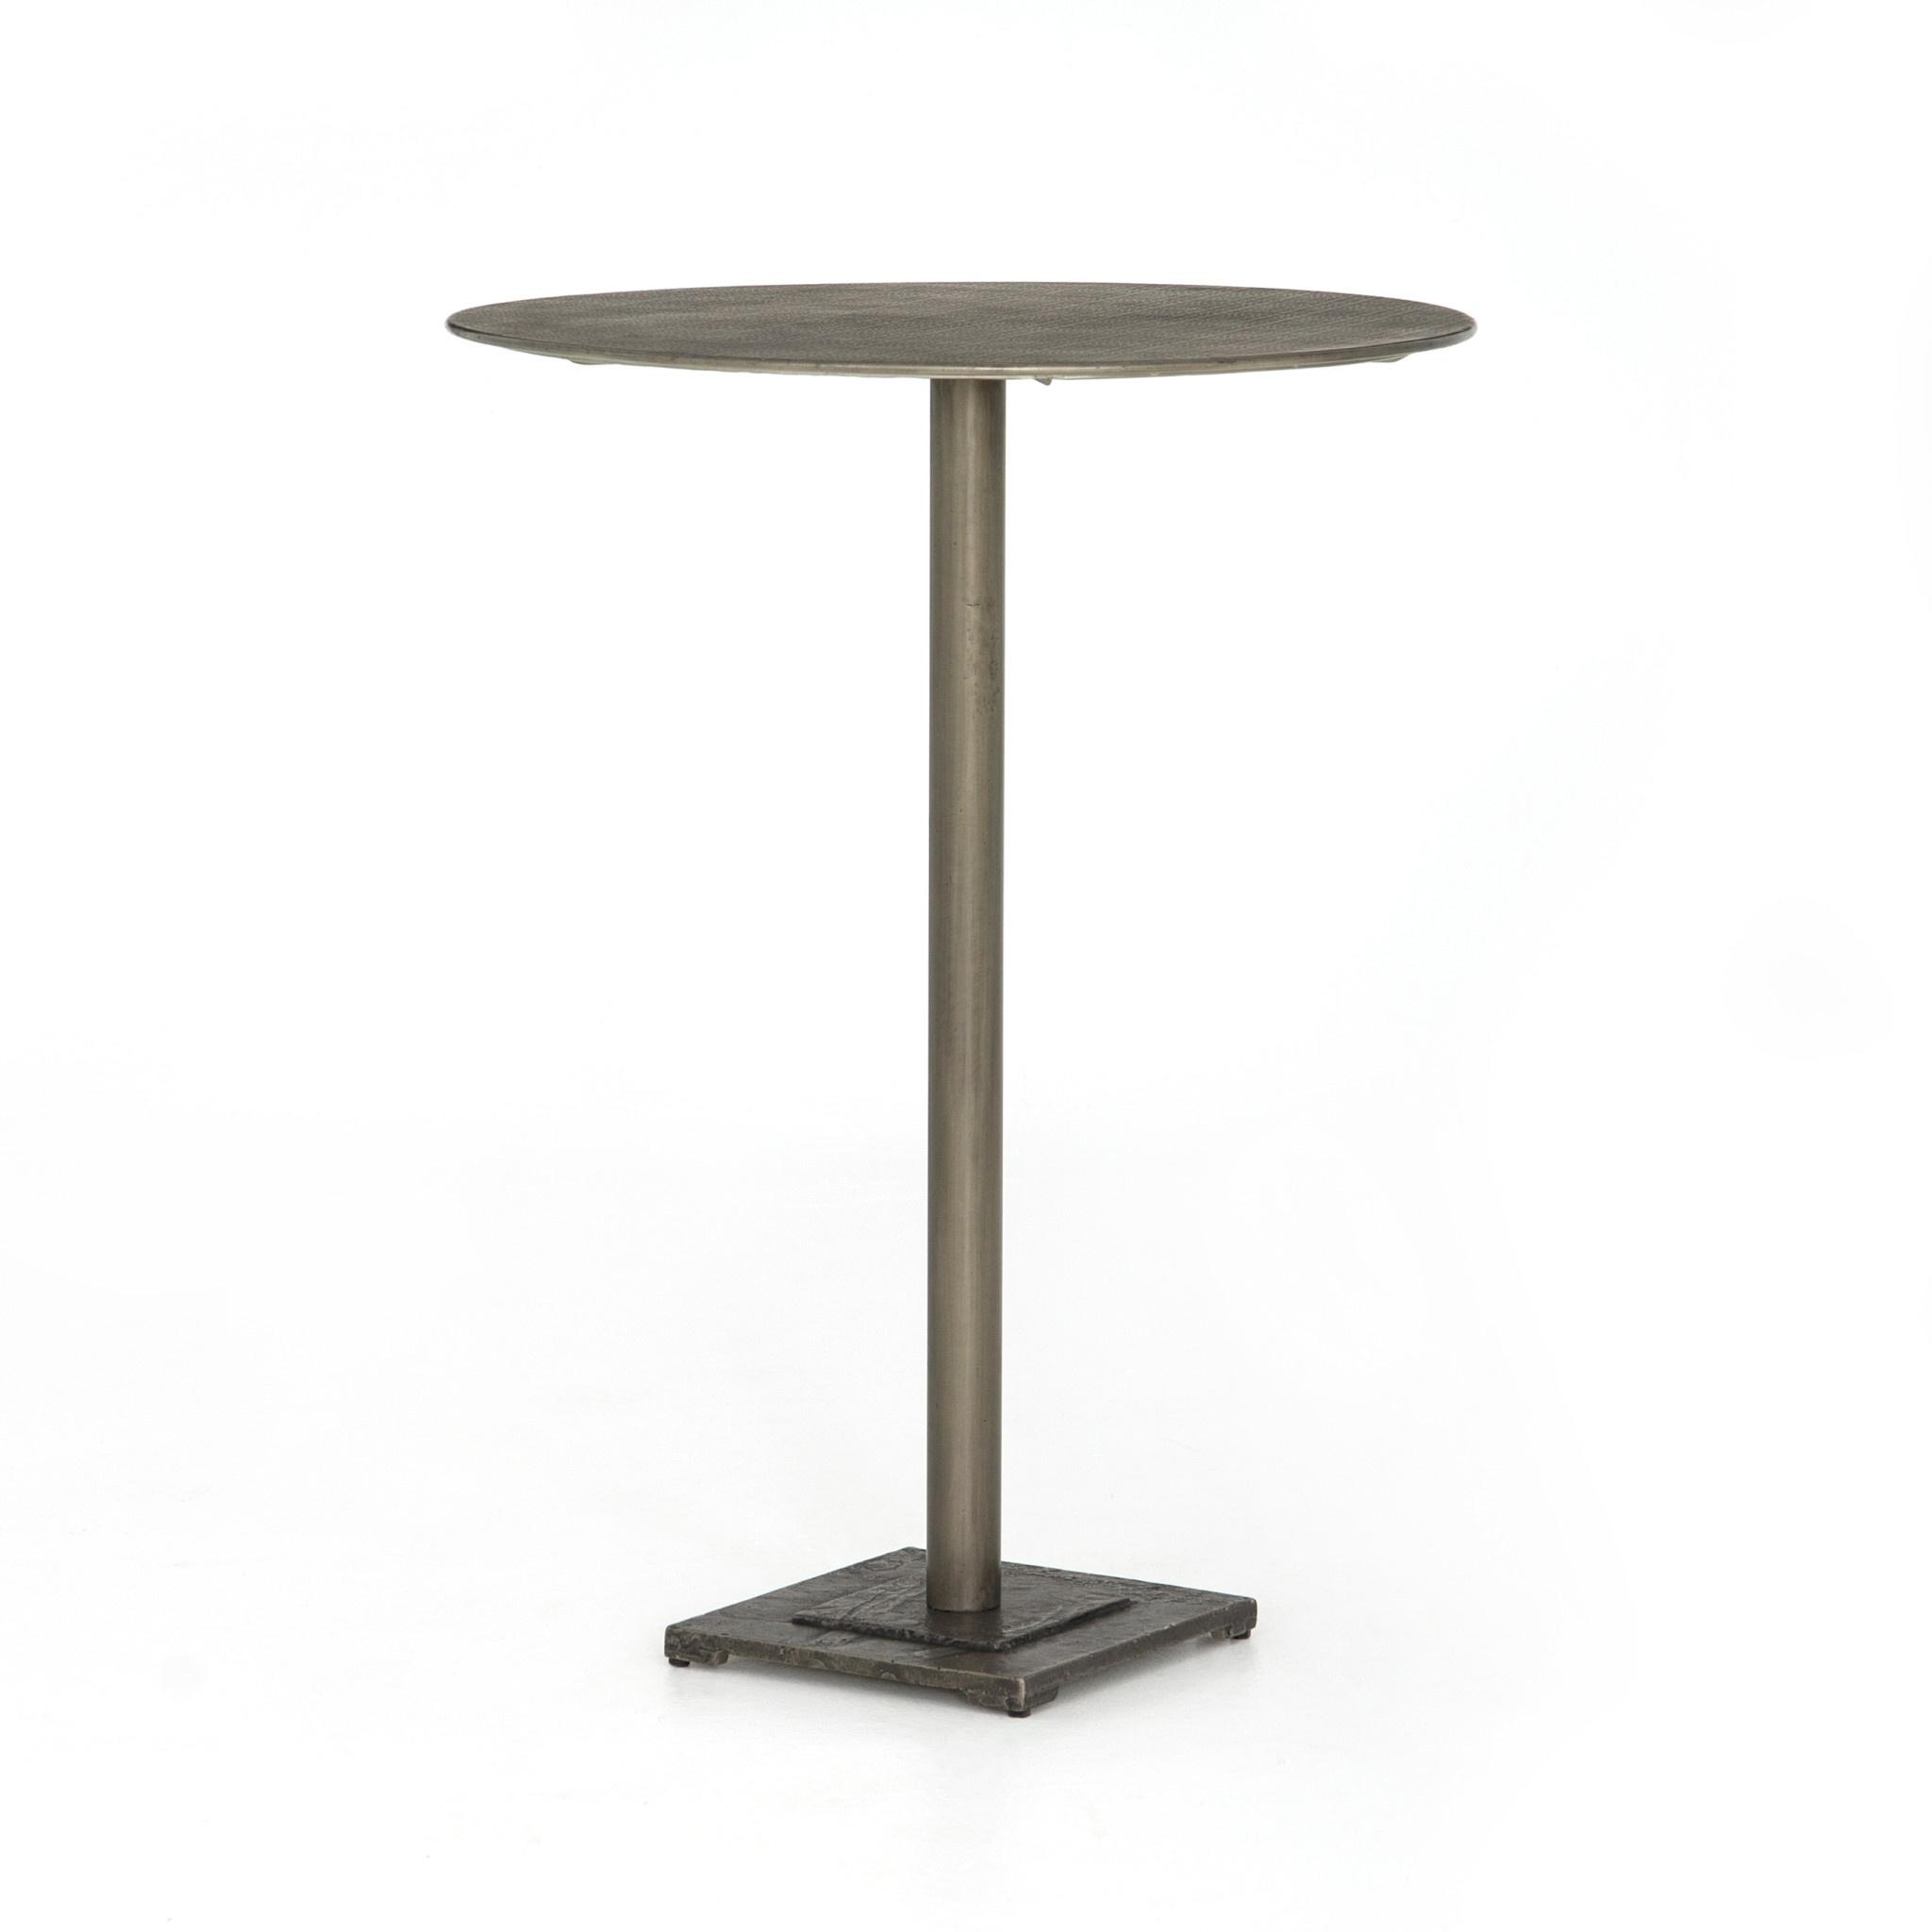 FANNIN BAR TABLE - NICKEL